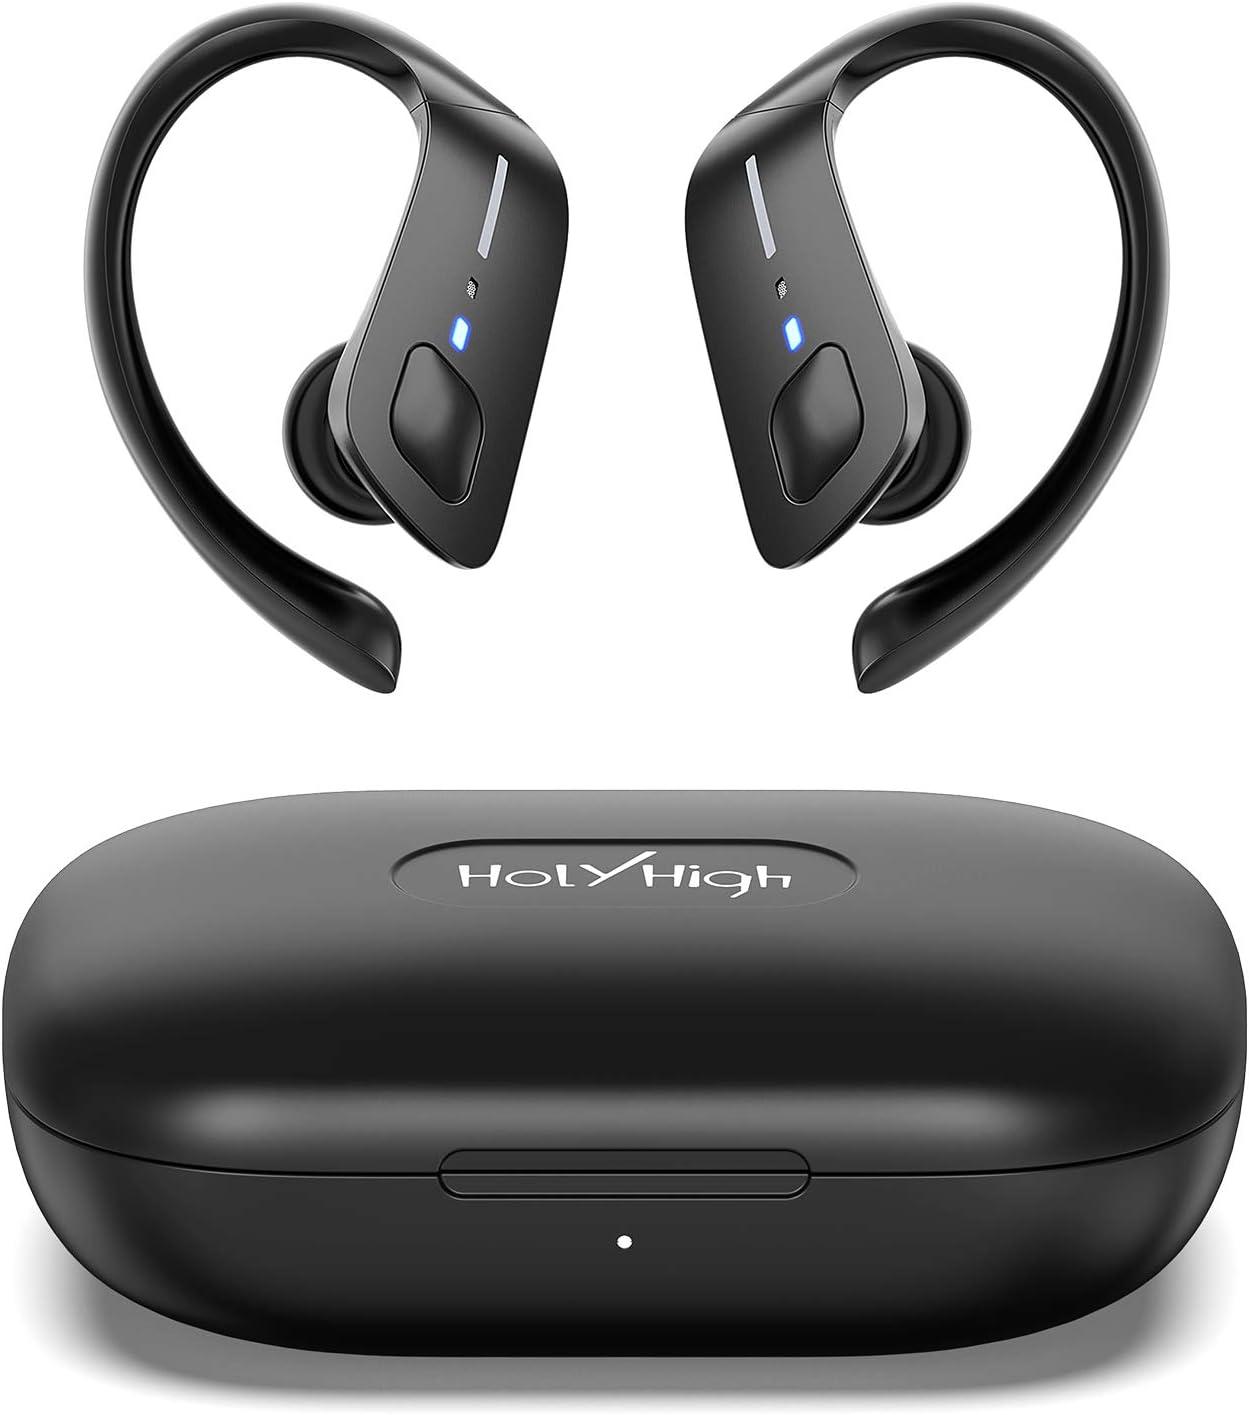 HolyHigh Auriculares Inalambricos Deportes Auriculares Bluetooth 5.0 Deportivos IPX7 Impermeable 30H Autonomia Auriculares Inalámbricos Bluetooth con Caja de Carga Micro Running para iOS Android